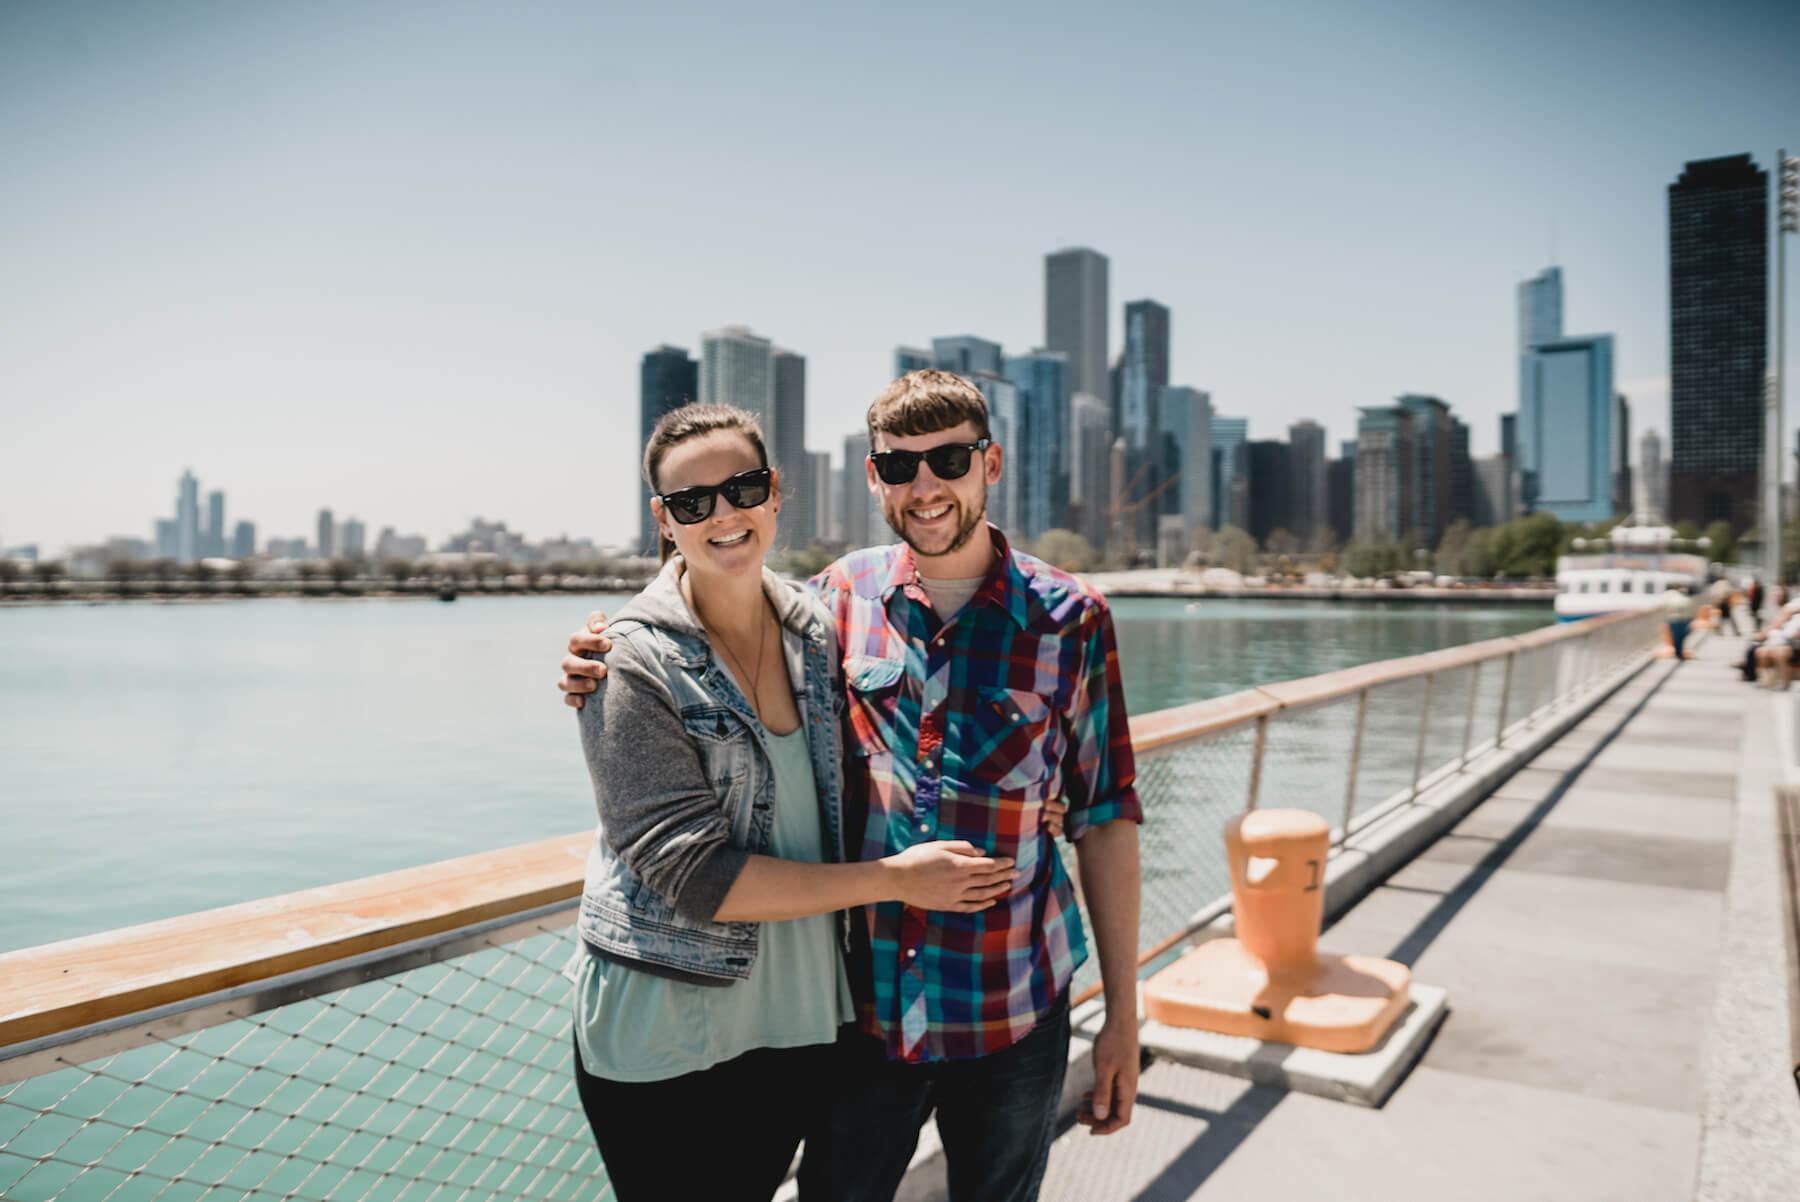 engle-olson-chicago-family-reunion-9.jpg